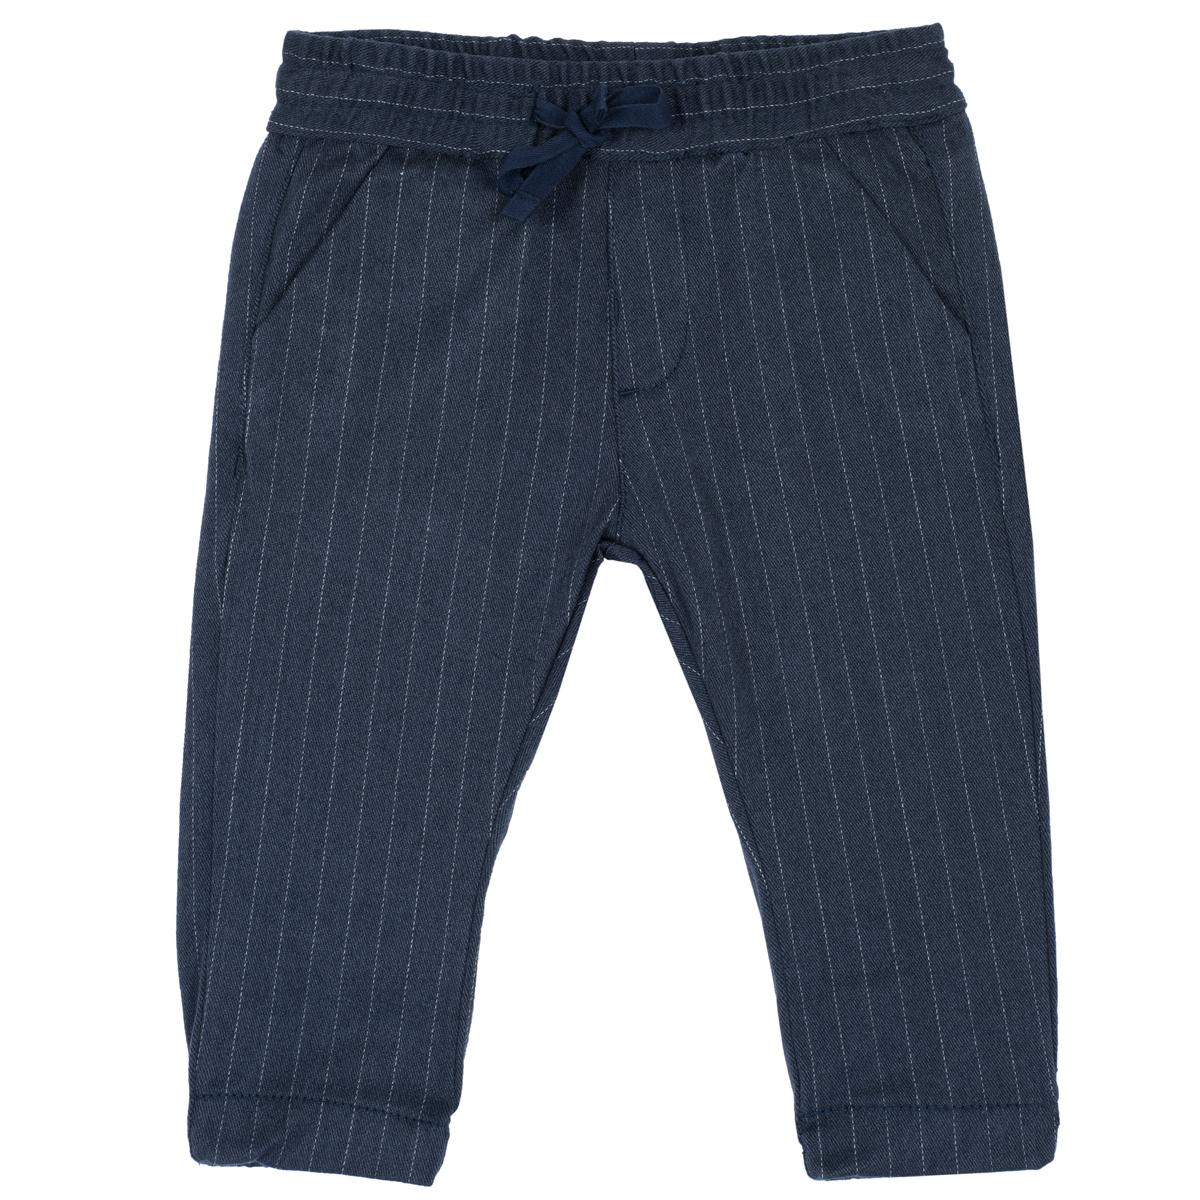 Pantalon lung copii Chicco, albastru inchis, 08027 din categoria Pantaloni copii